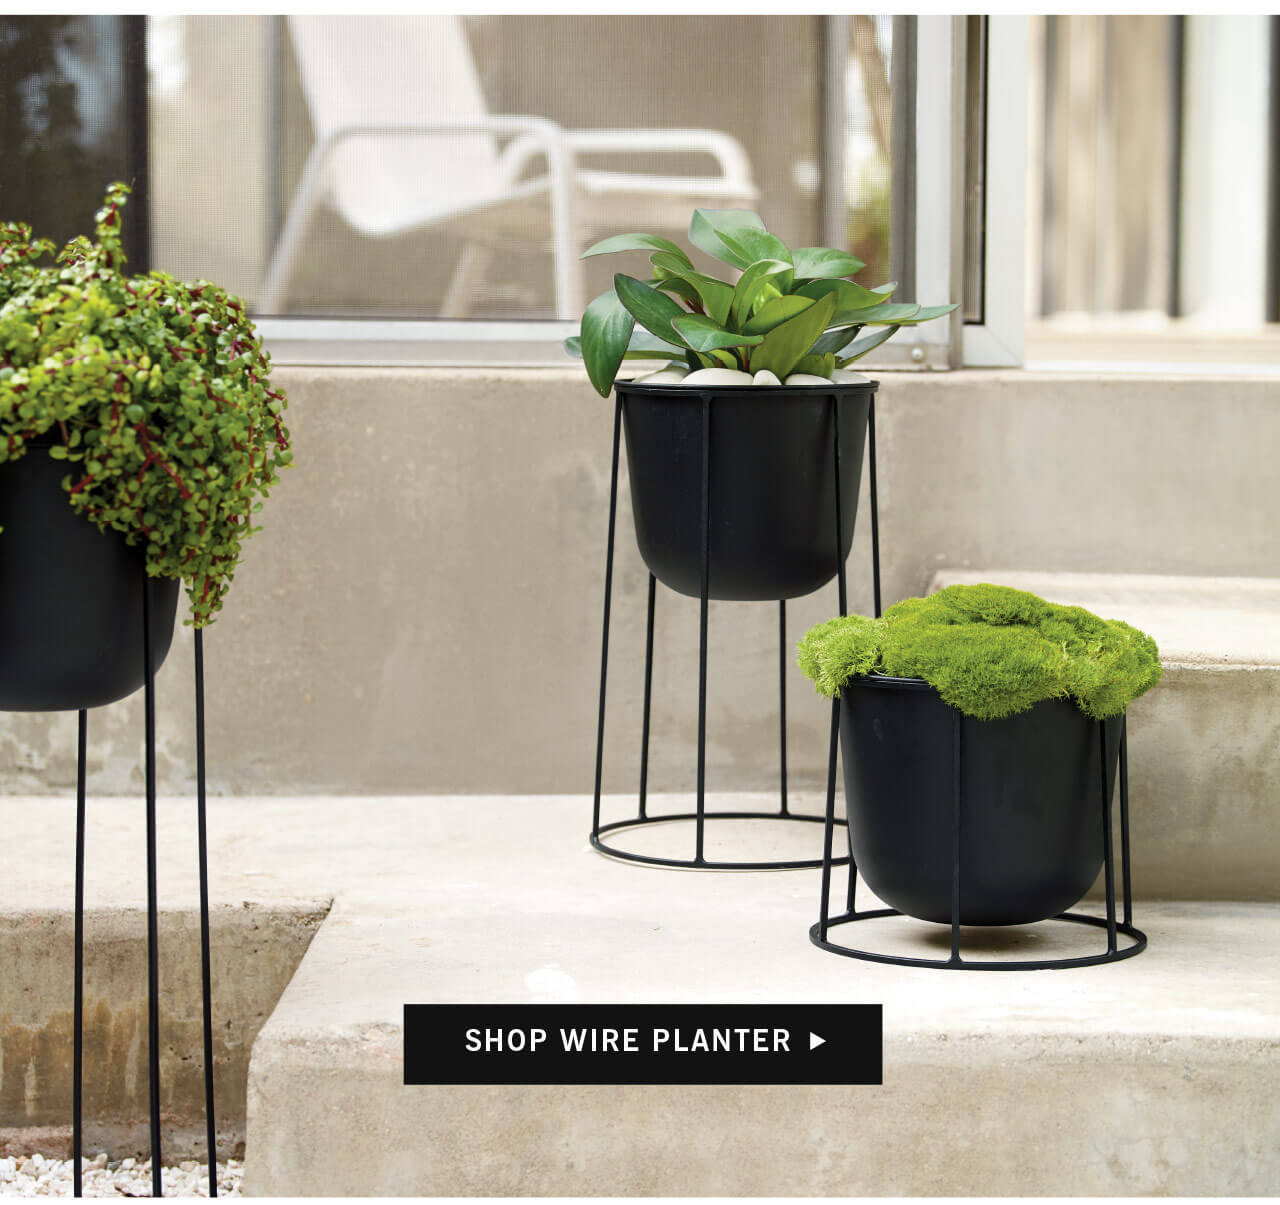 Shop Wire Planter